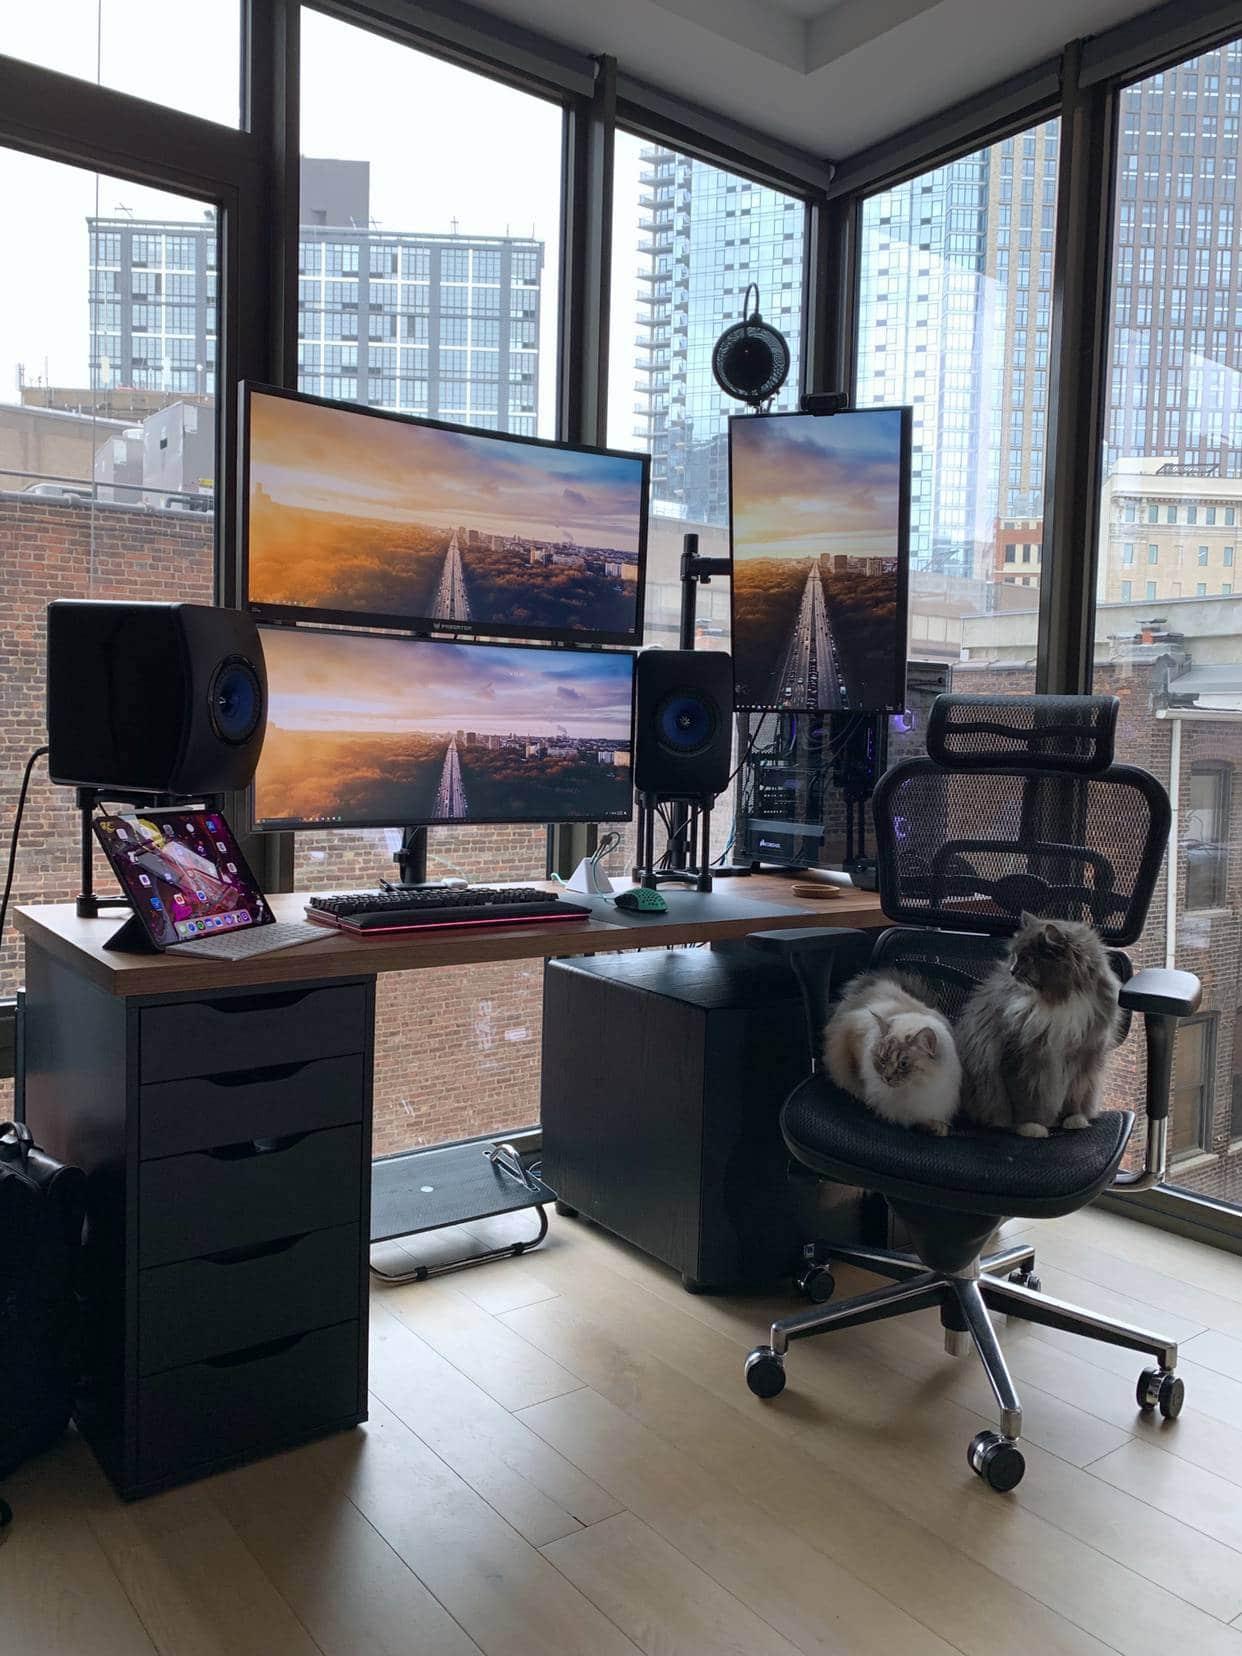 Brooklyn High Rise With Big Monitors